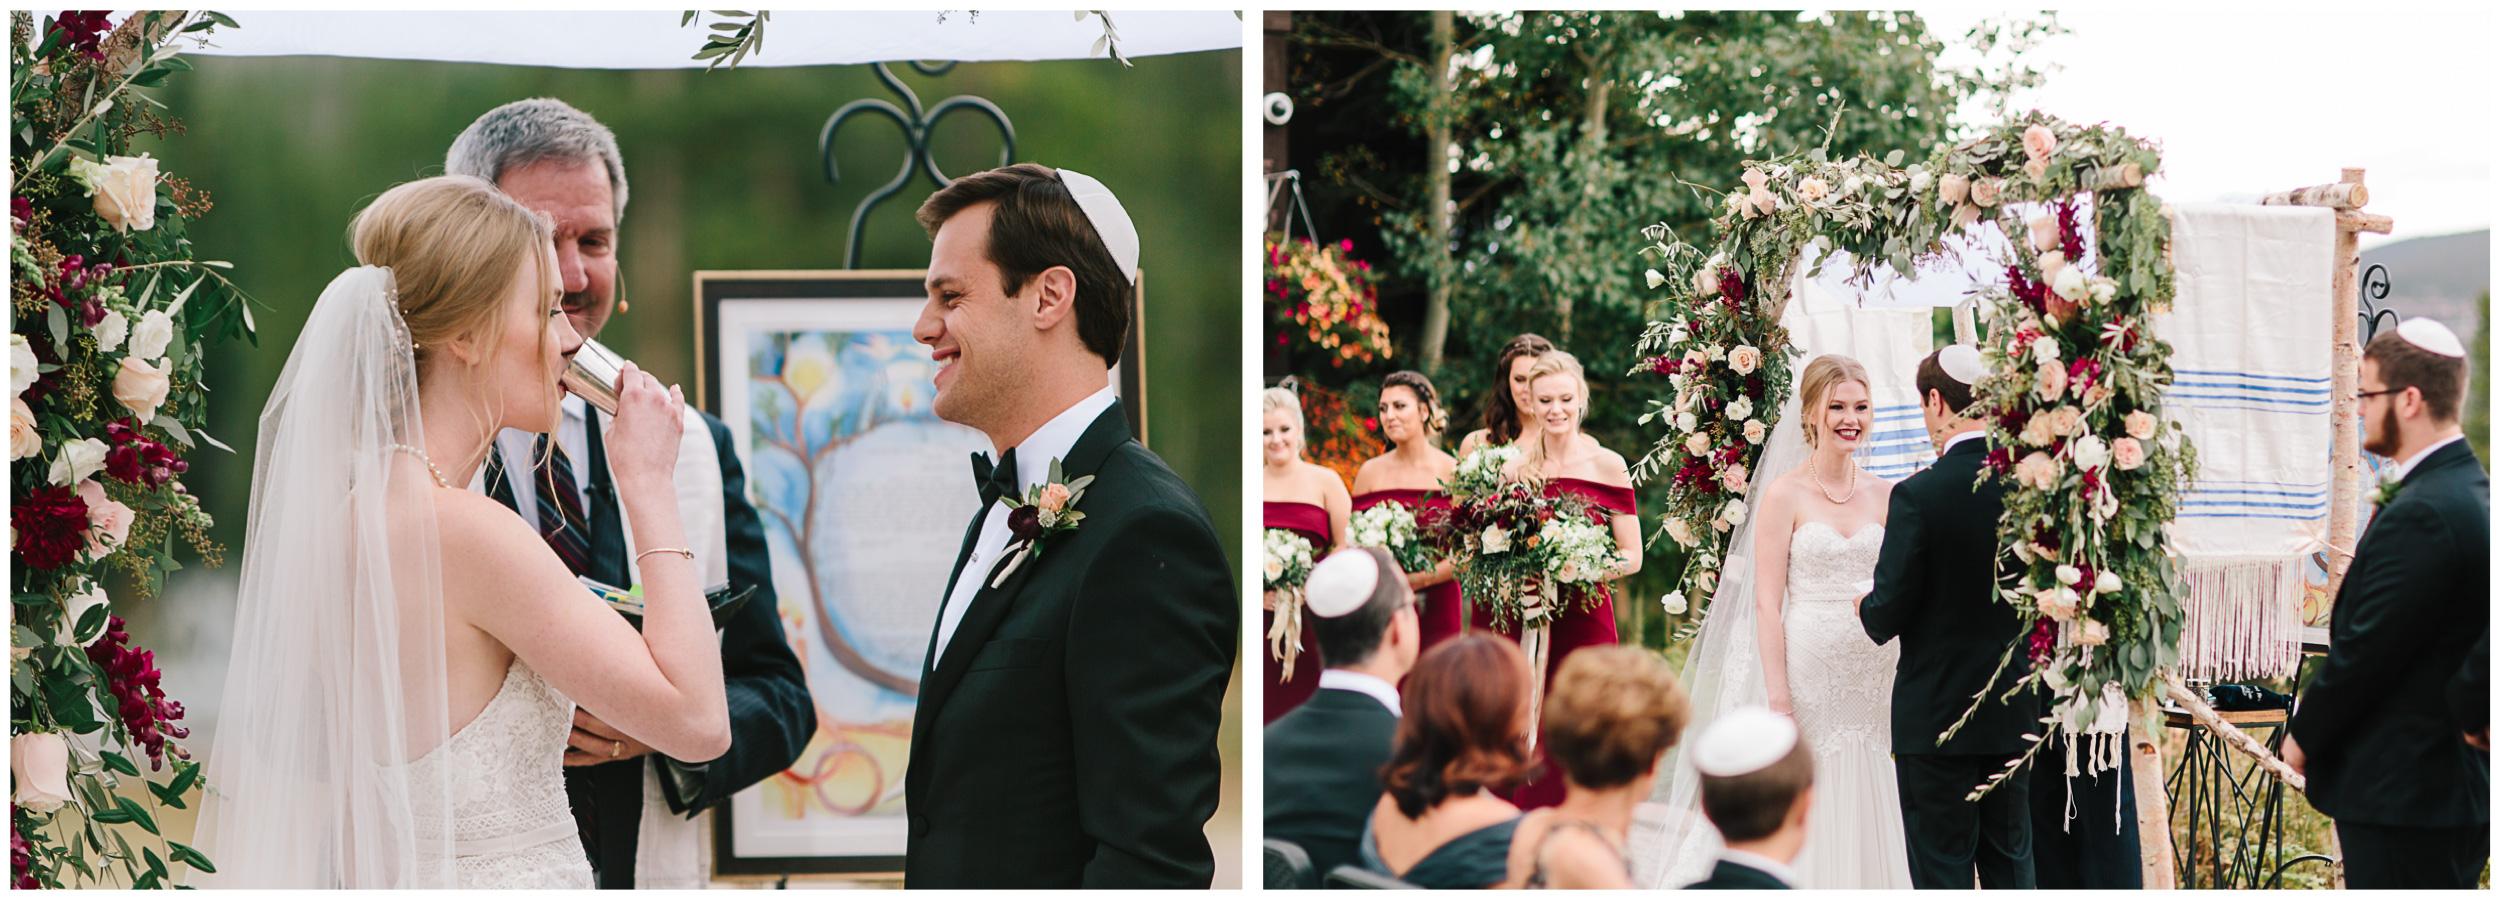 ten_mile_station_wedding_40.jpg